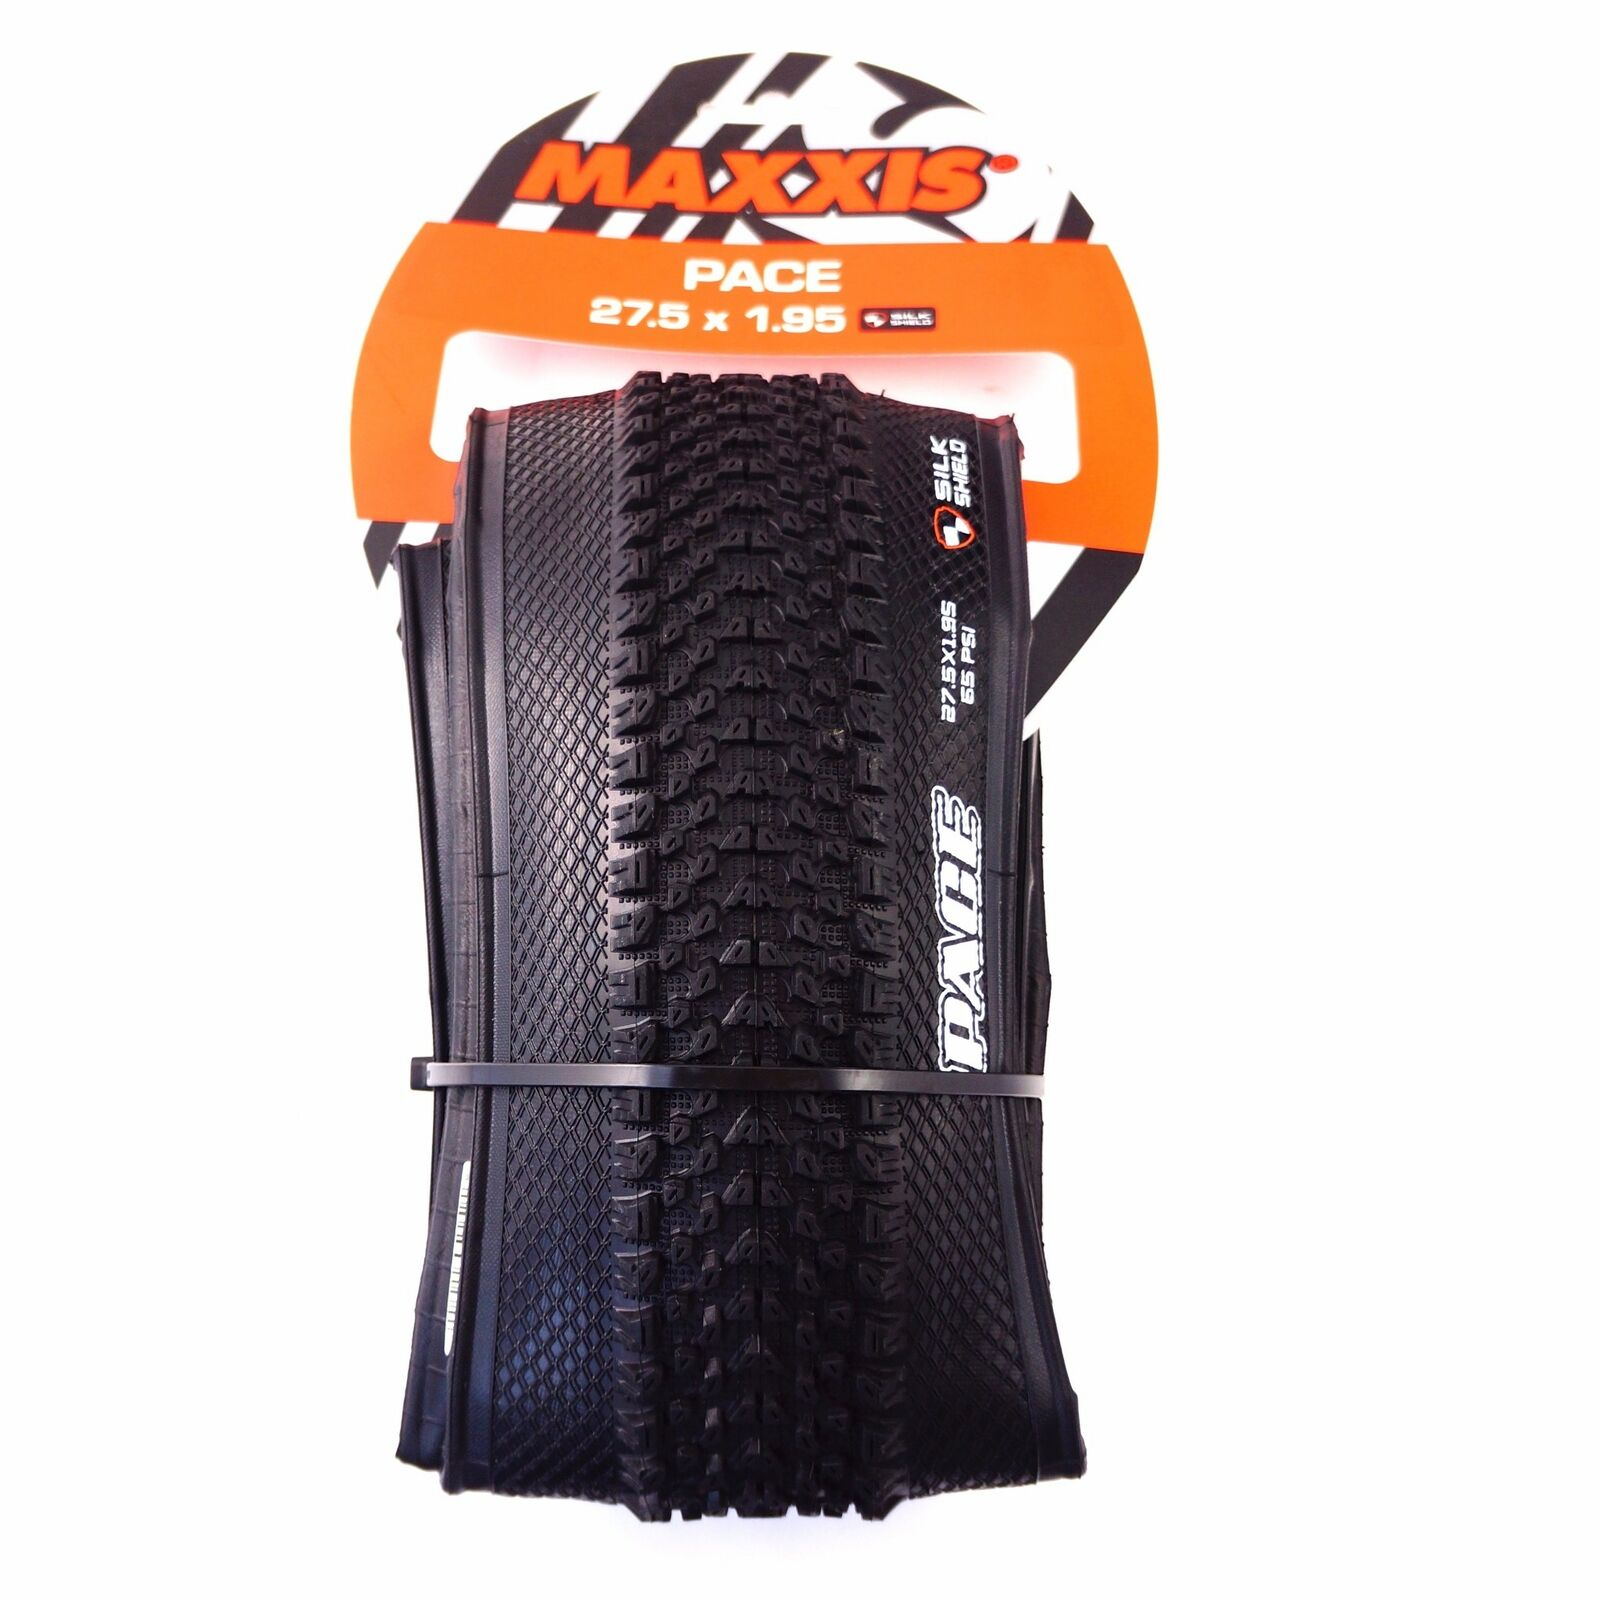 Maxxis Pace 27.5x1.95 M333 650B MTB Bike Foldable Cross Country Tire